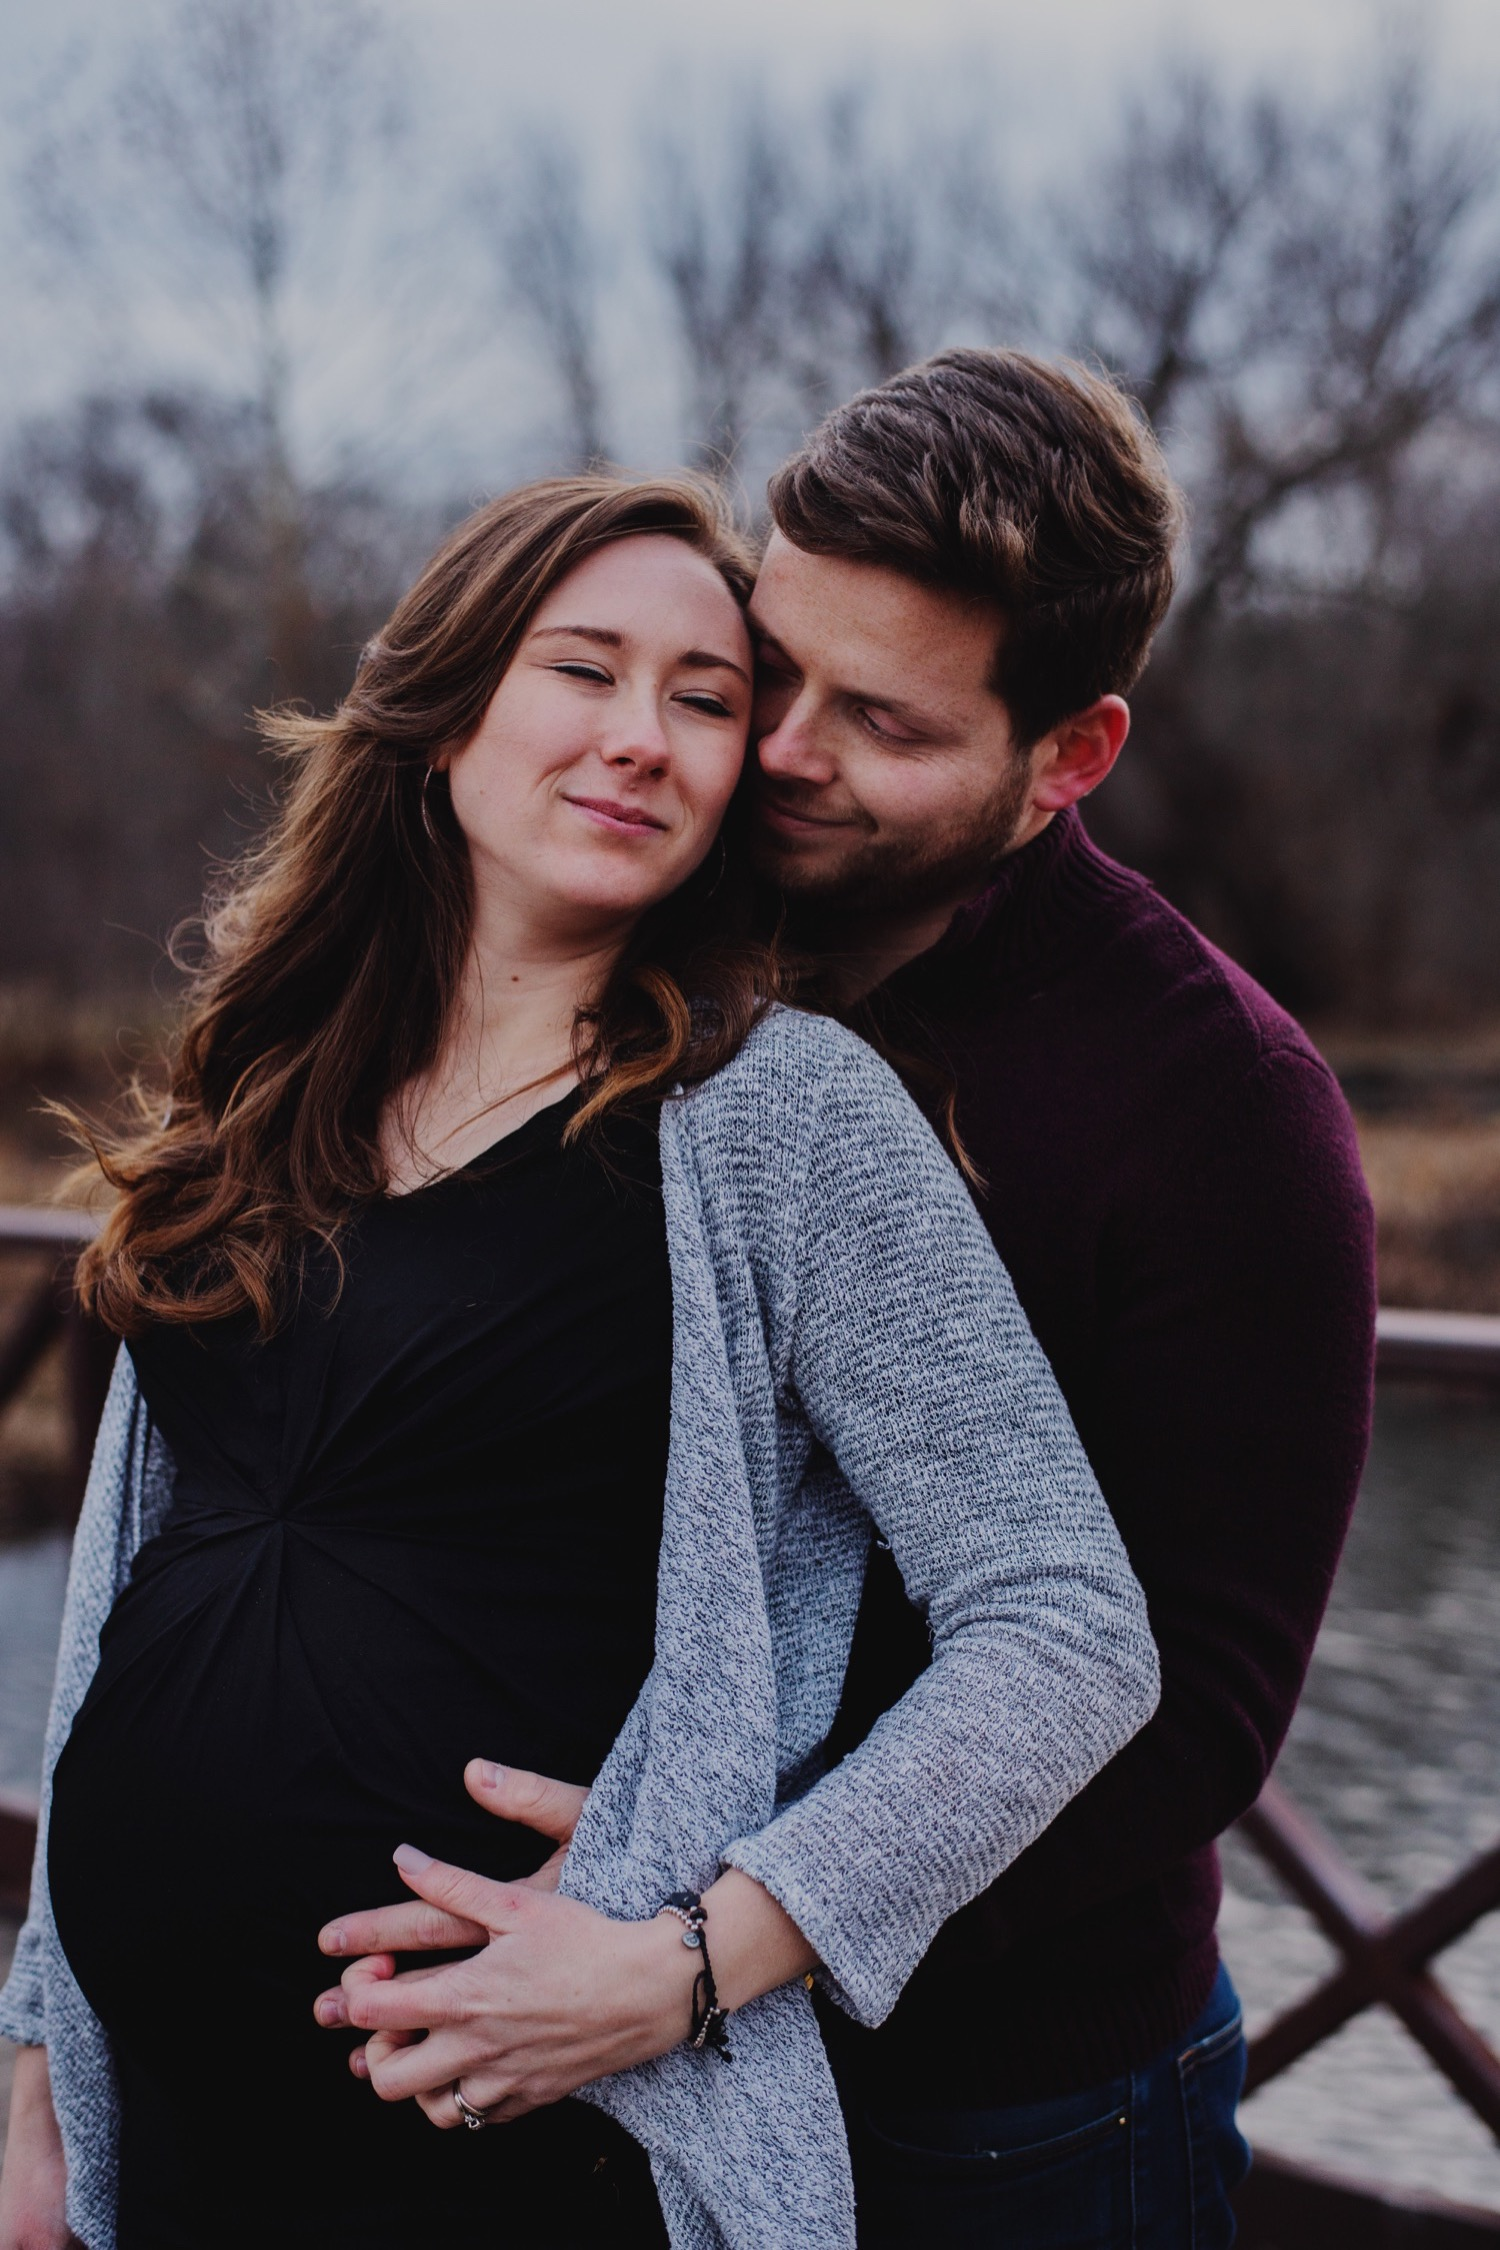 39_Gardner-Churchill-Woods-Maternity_0835_maternity_maternityphotography_maternitysession.jpg